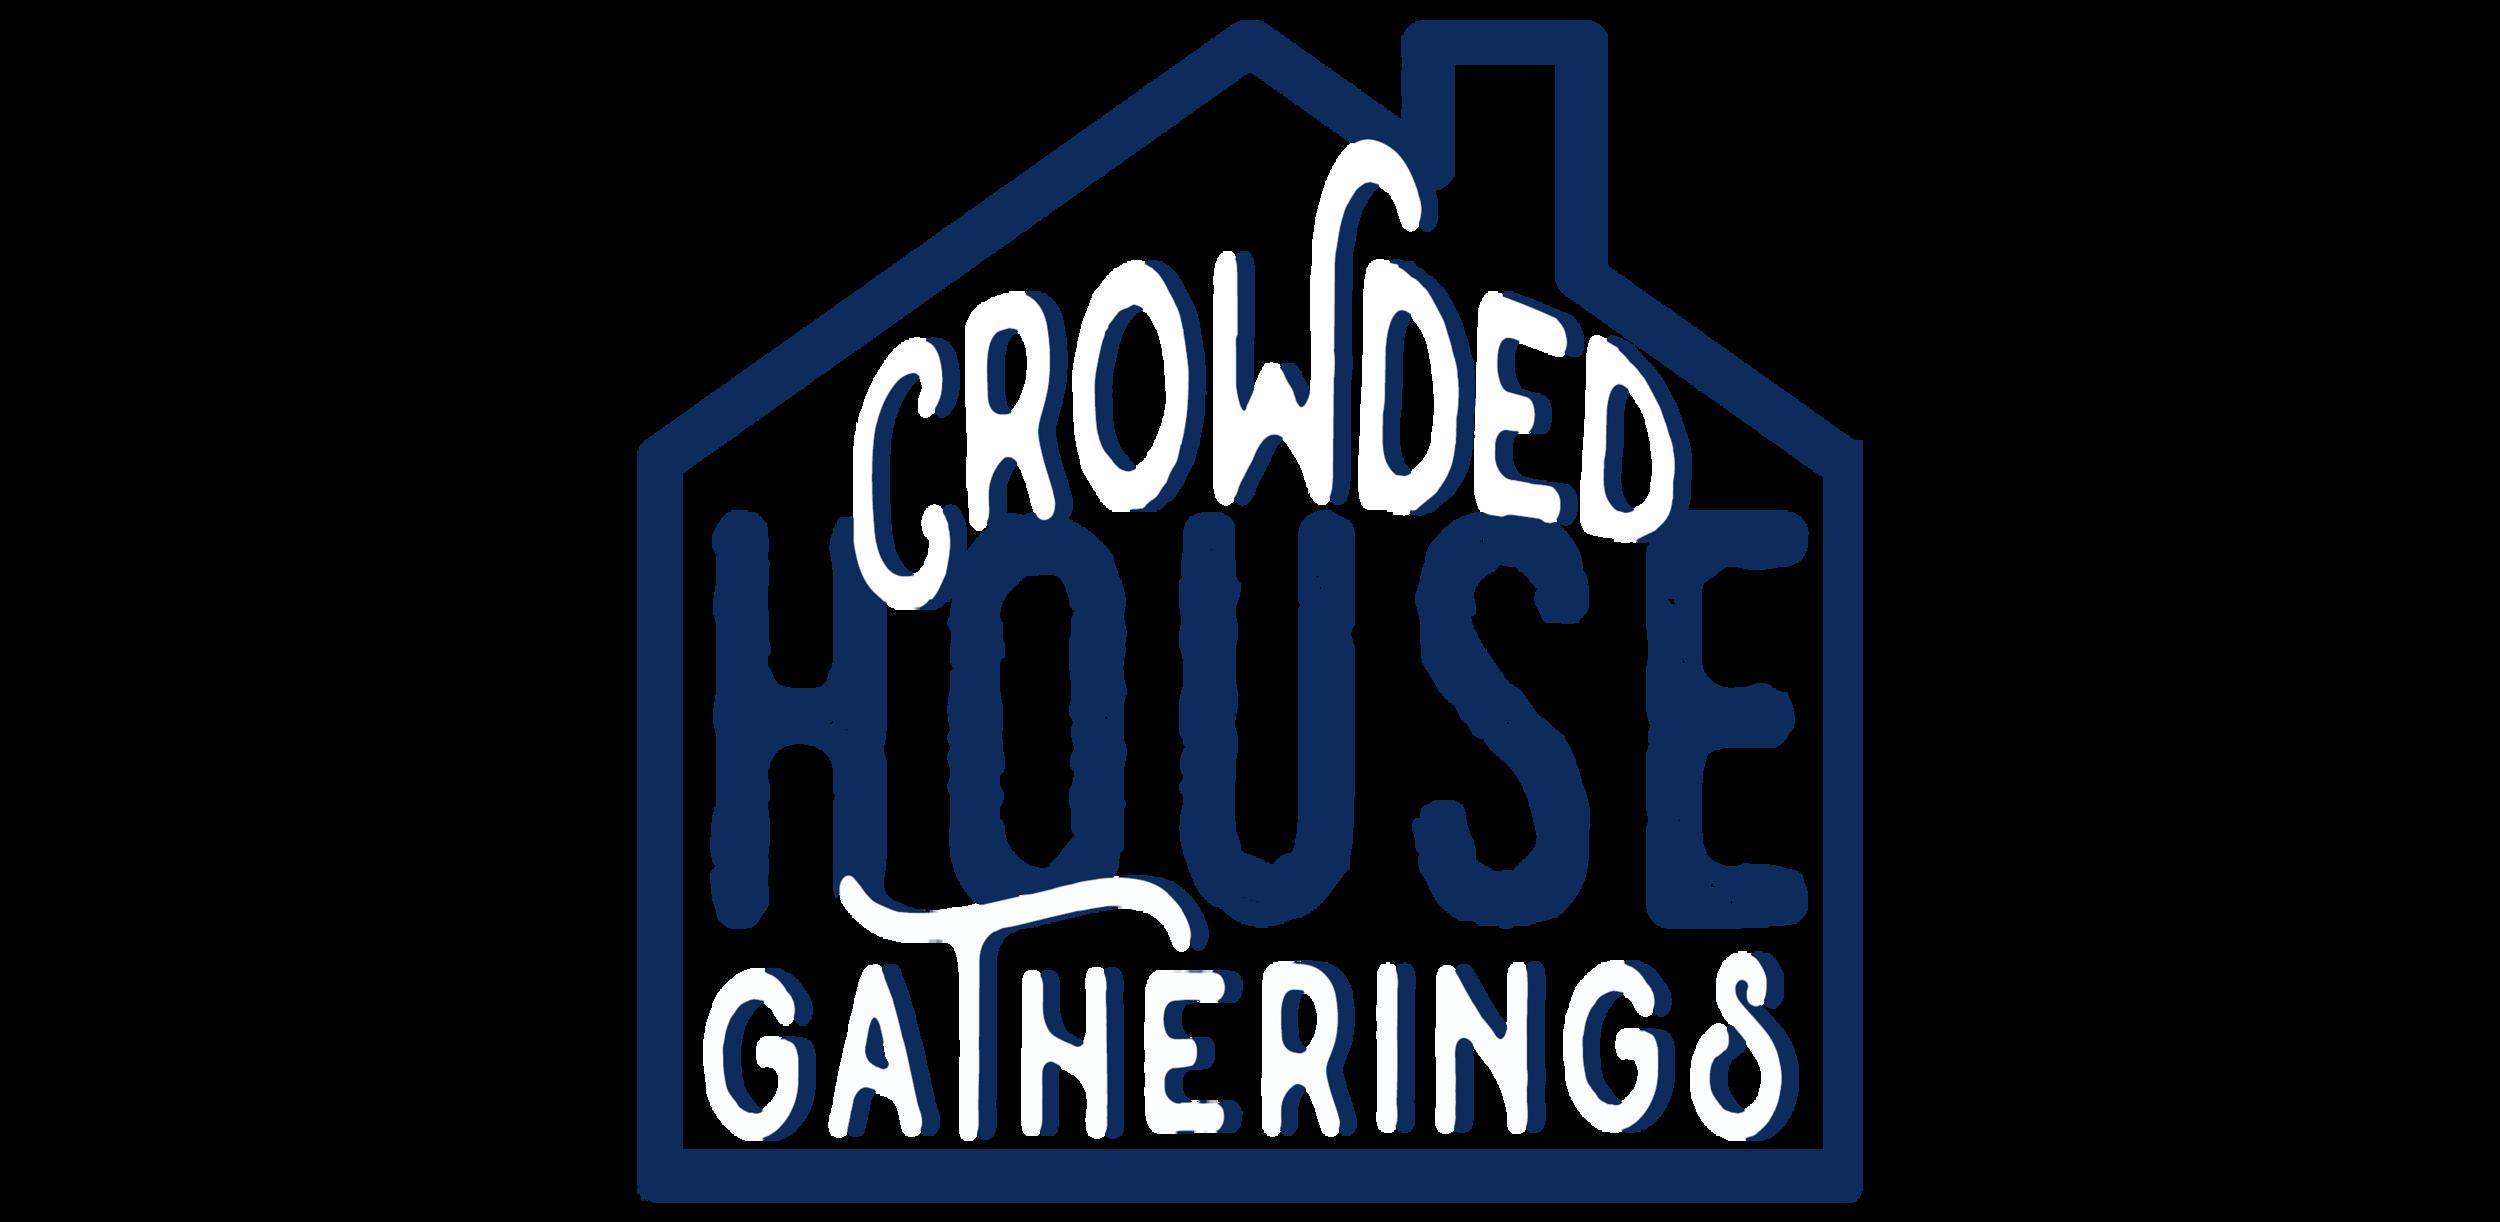 crowdedhousegatherings_logo copy.png